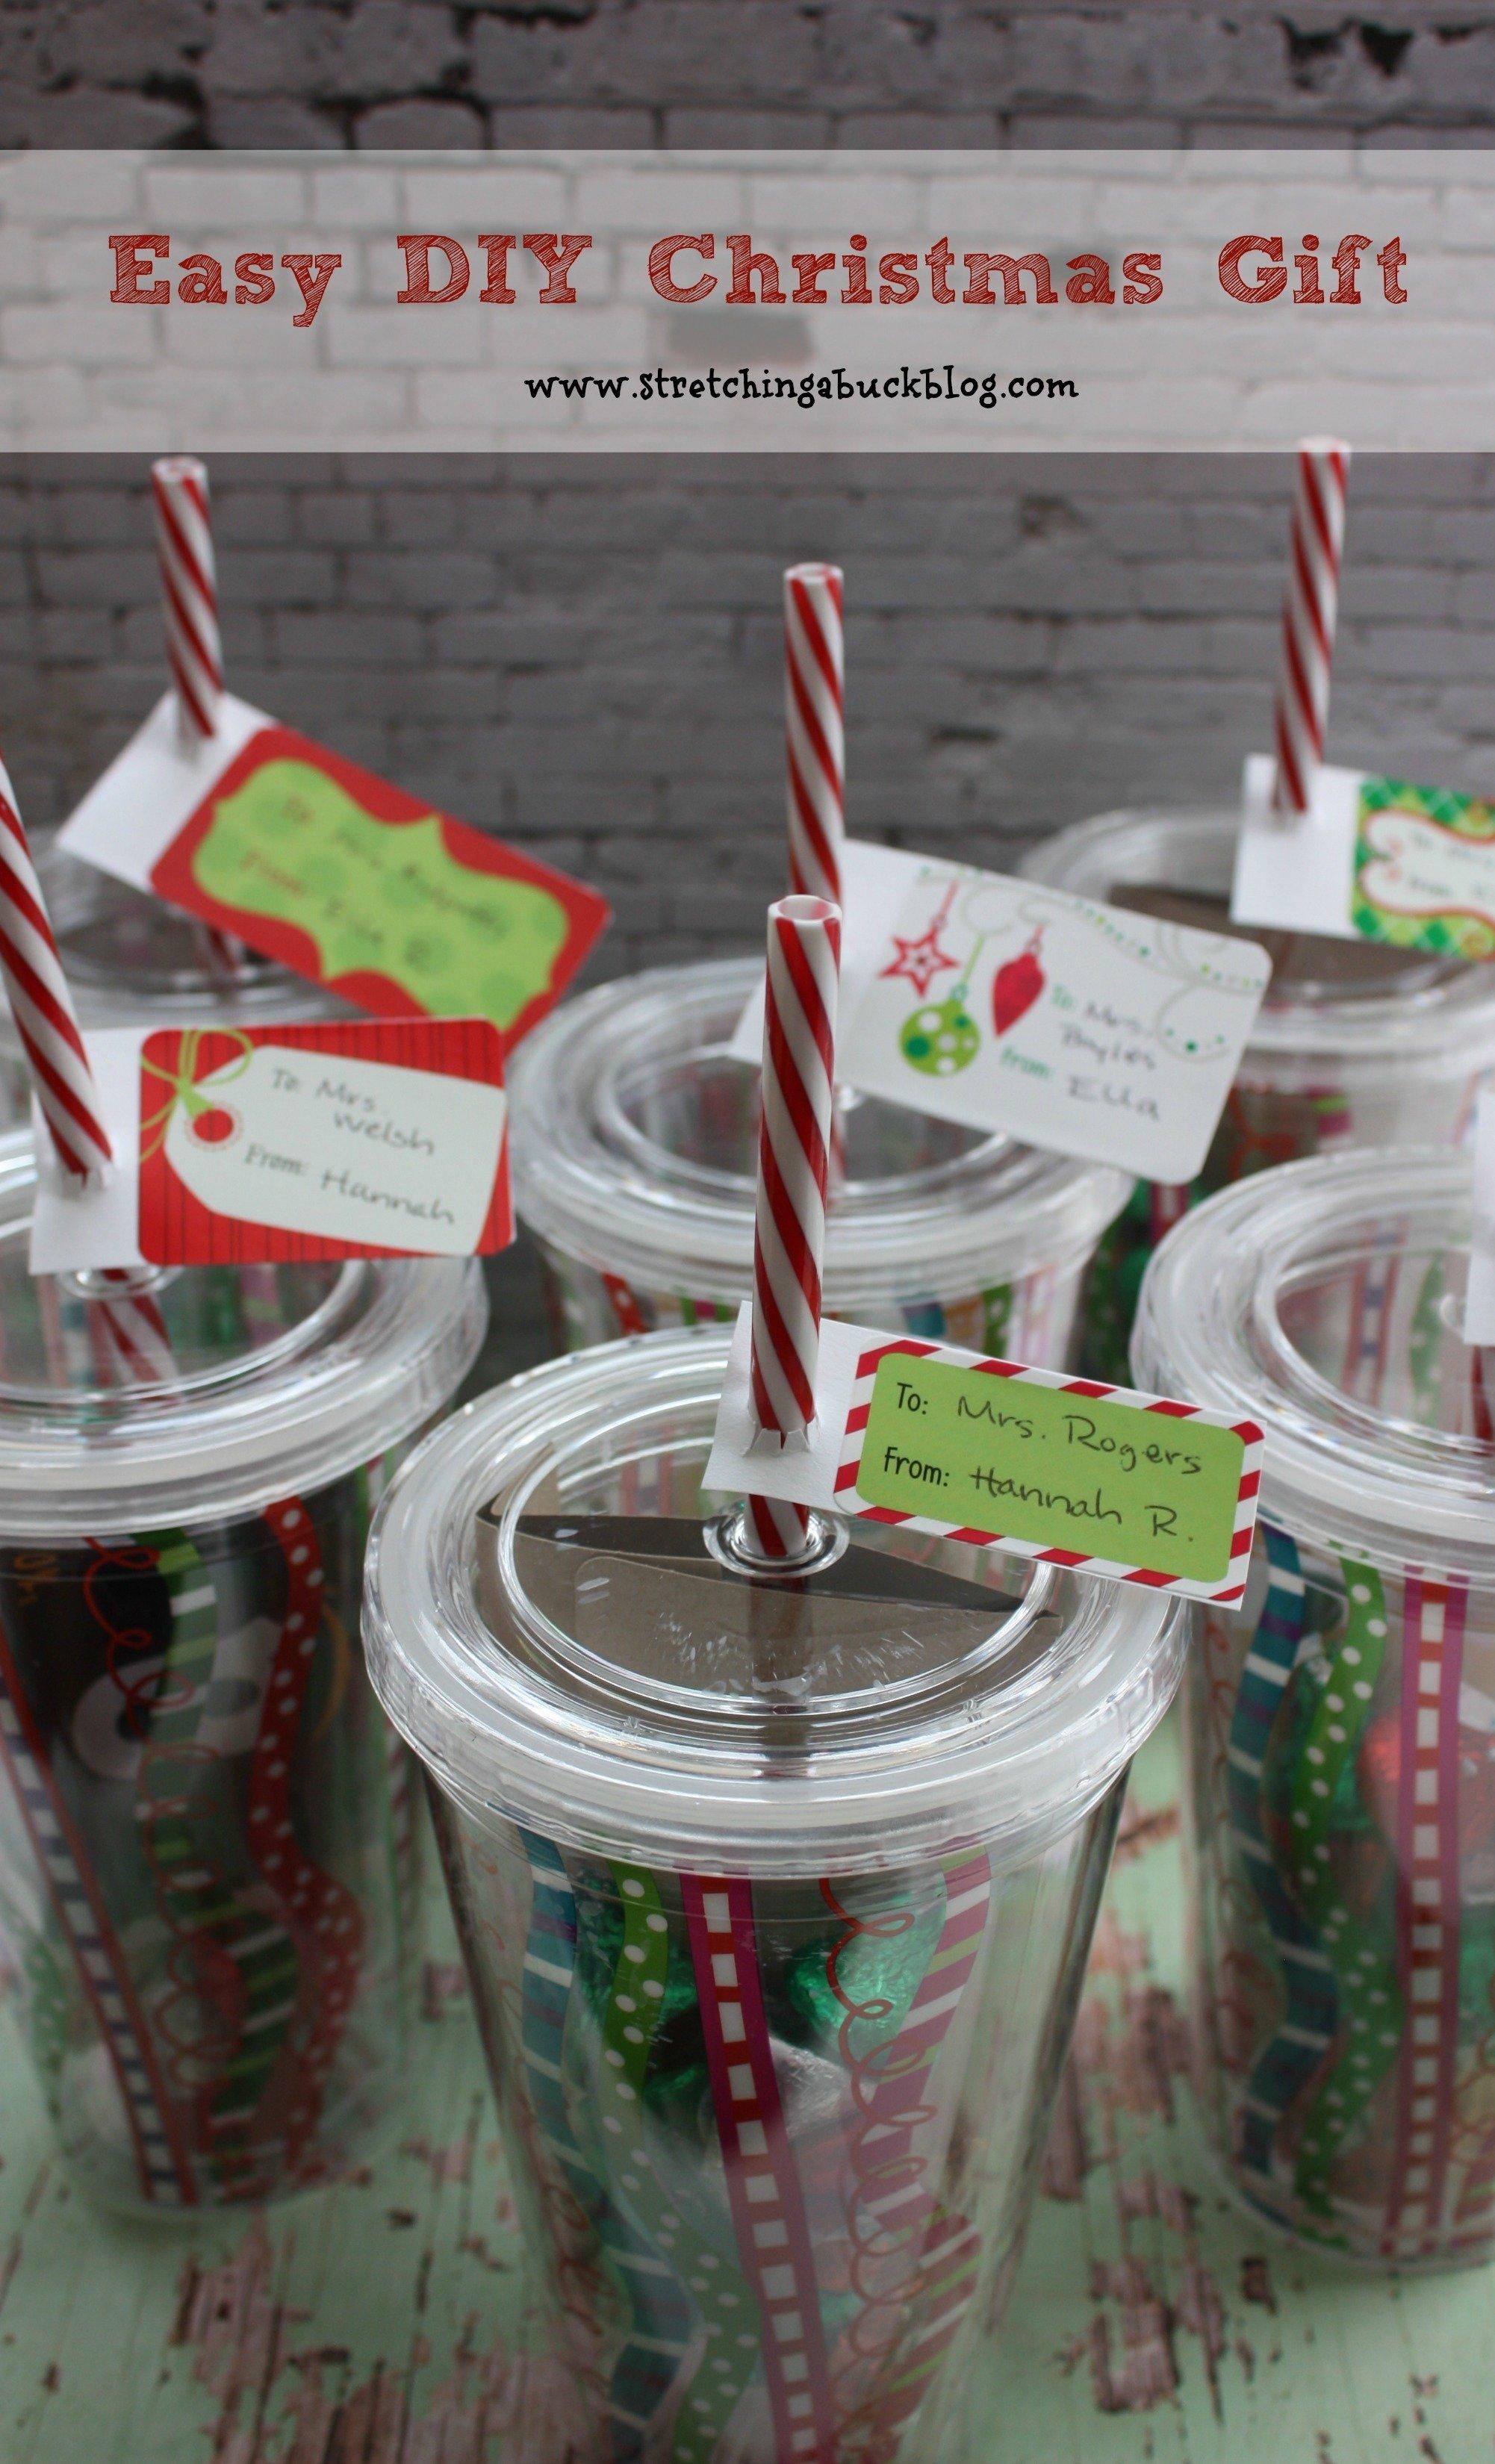 easy diy christmas gift idea for teachers, friends + more